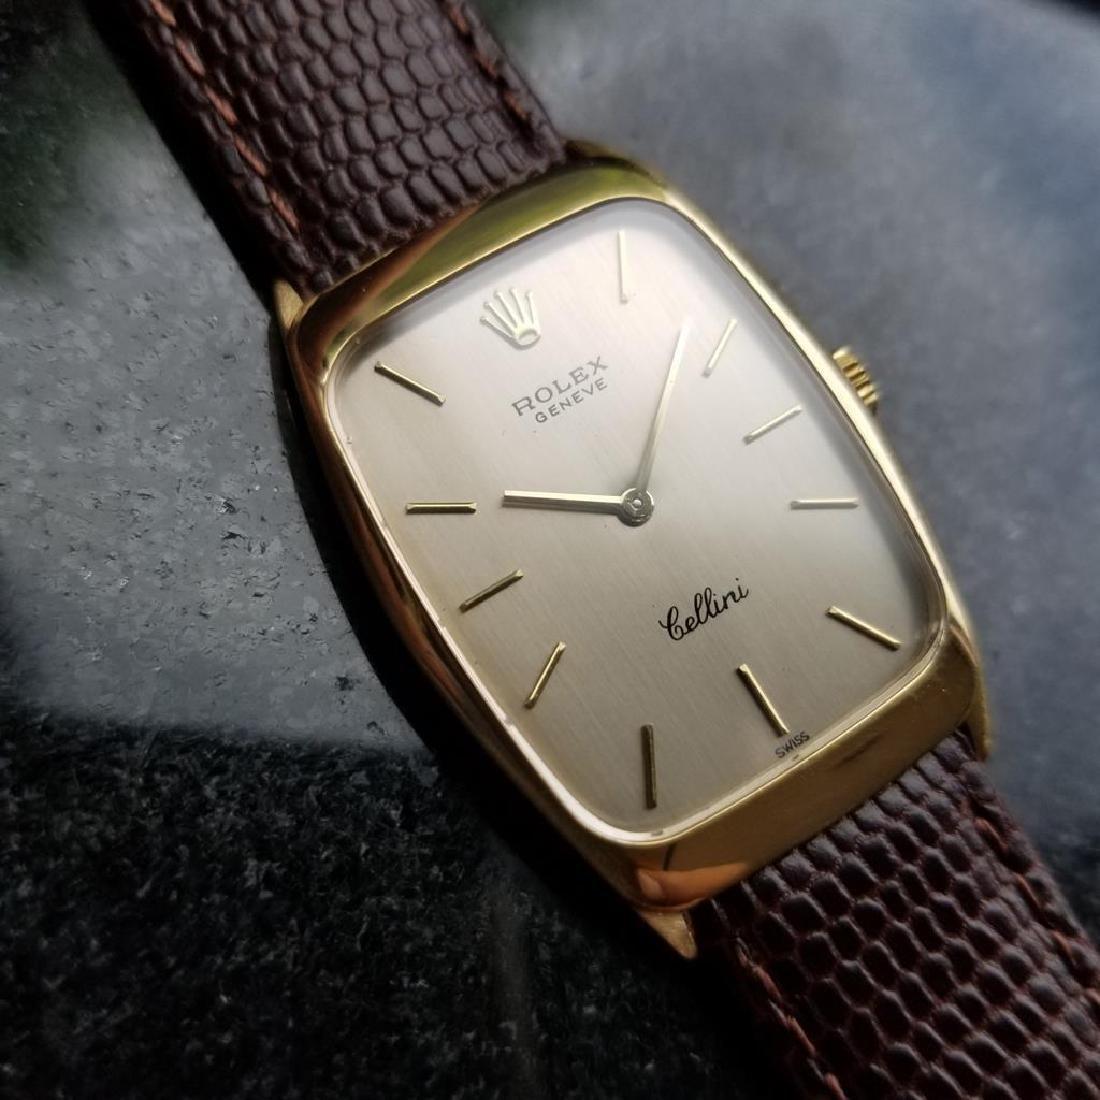 ROLEX Men's 18K Gold Cellini 4136 Hand-Wind Dress Watch - 2